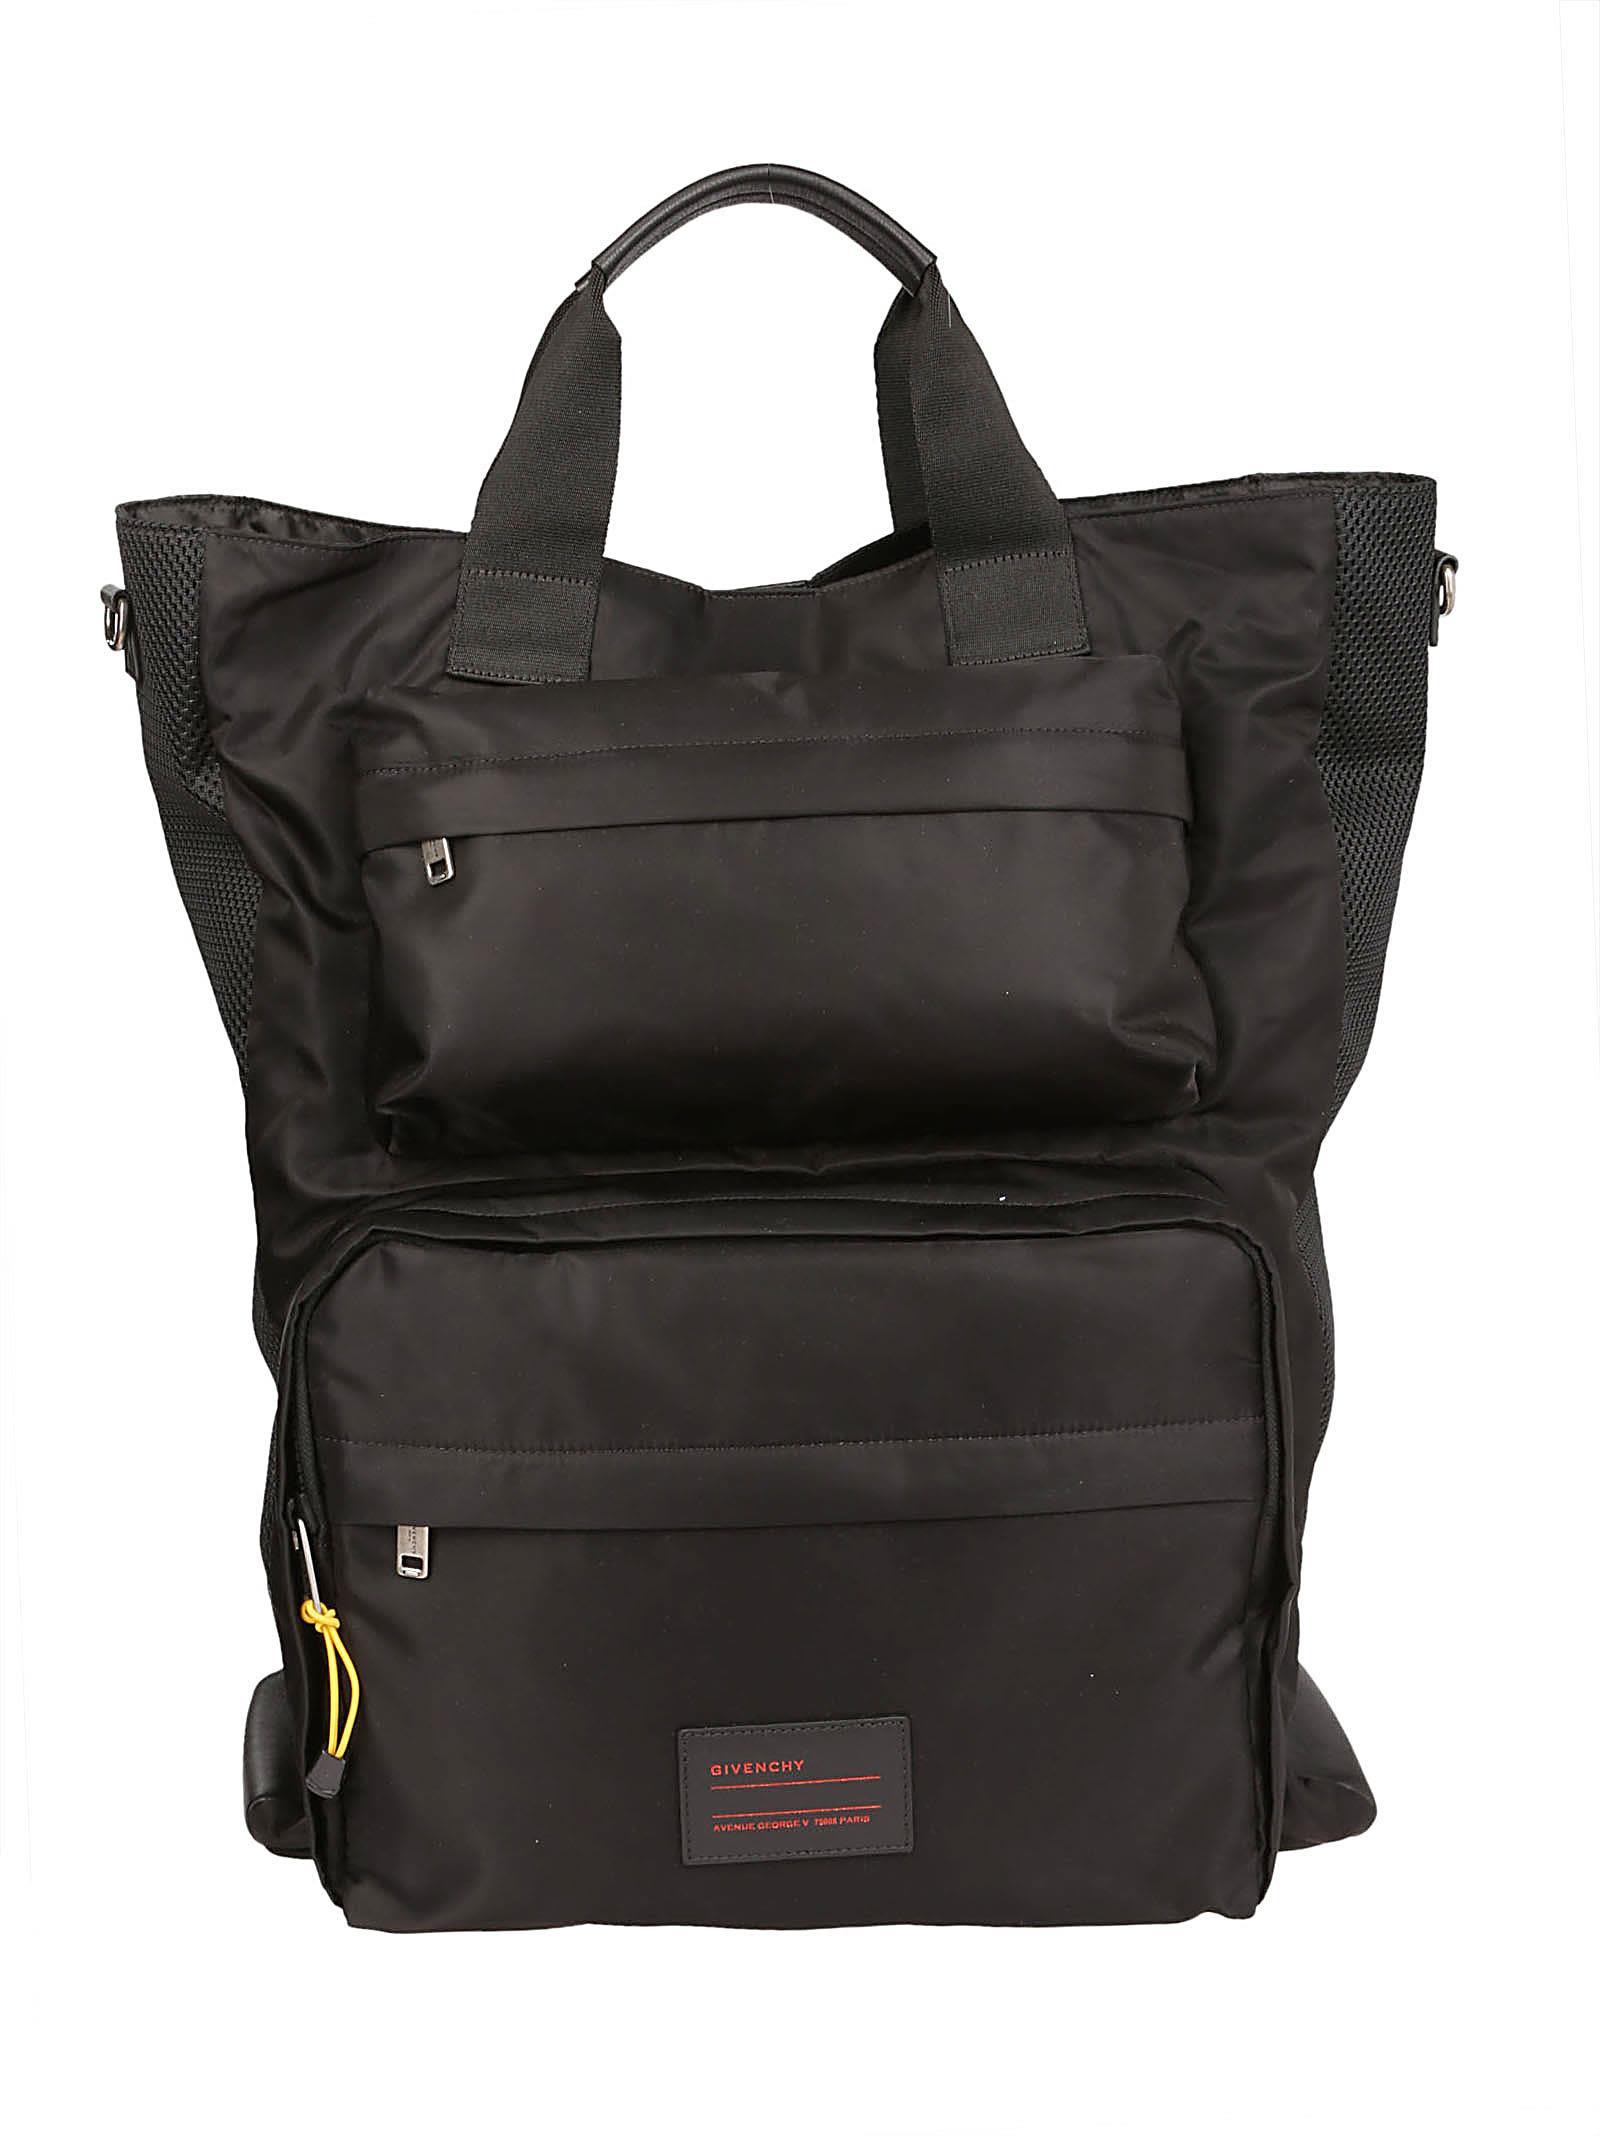 givenchy -  Oversized Backpack